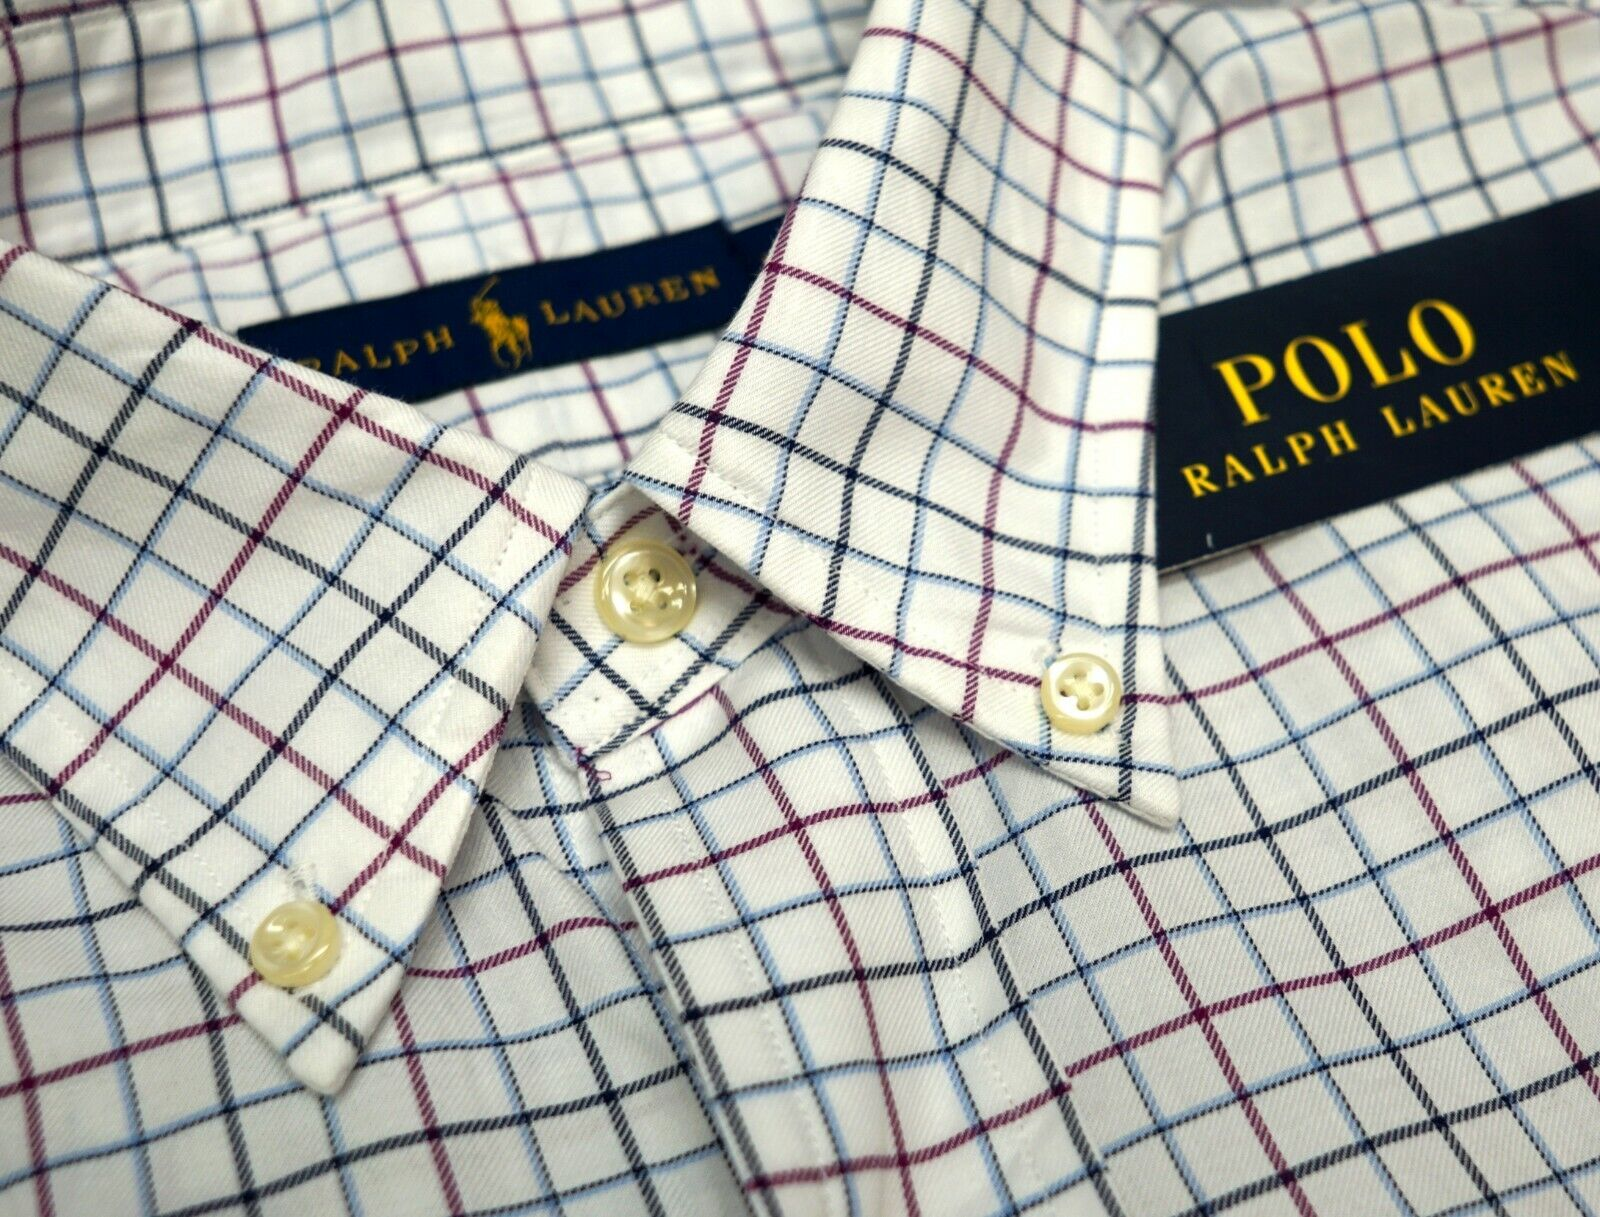 e0594791 NWT Polo Ralph Lauren Long Sleeve Shirt Mens M XL White Burgundy bluee  Plaid. Ralph Lauren Slim Fit ...